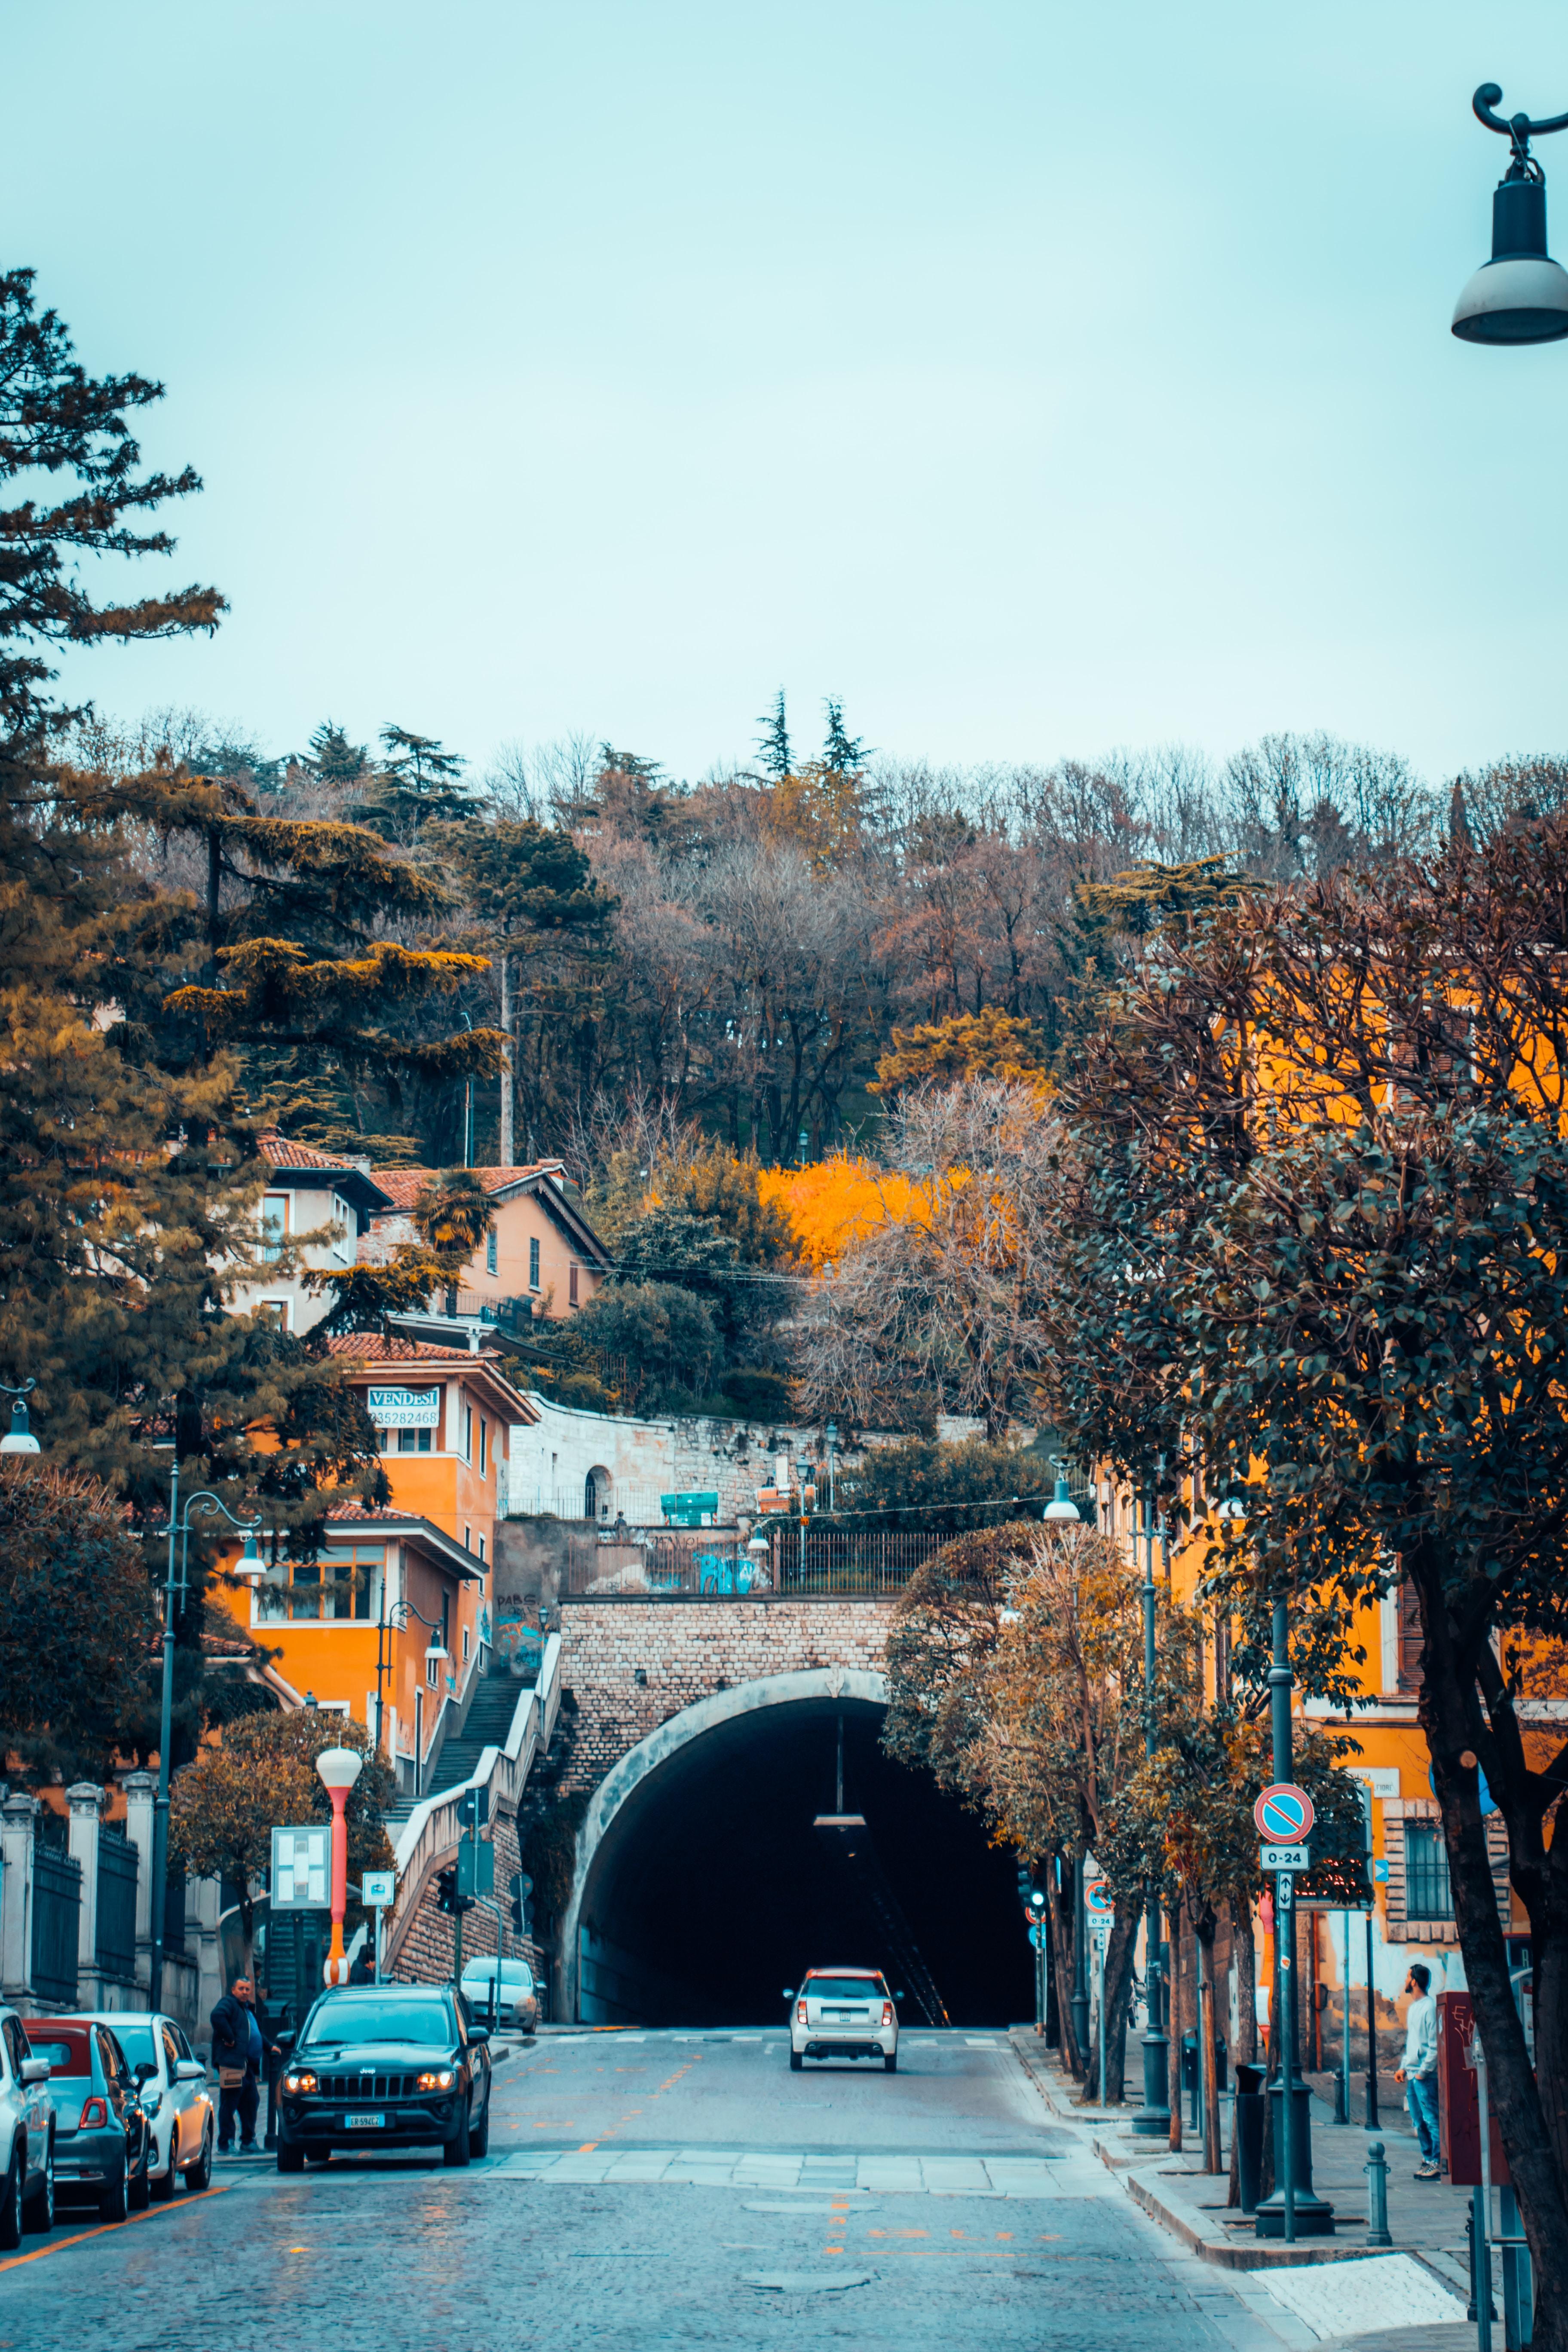 Street of Brescia Italy